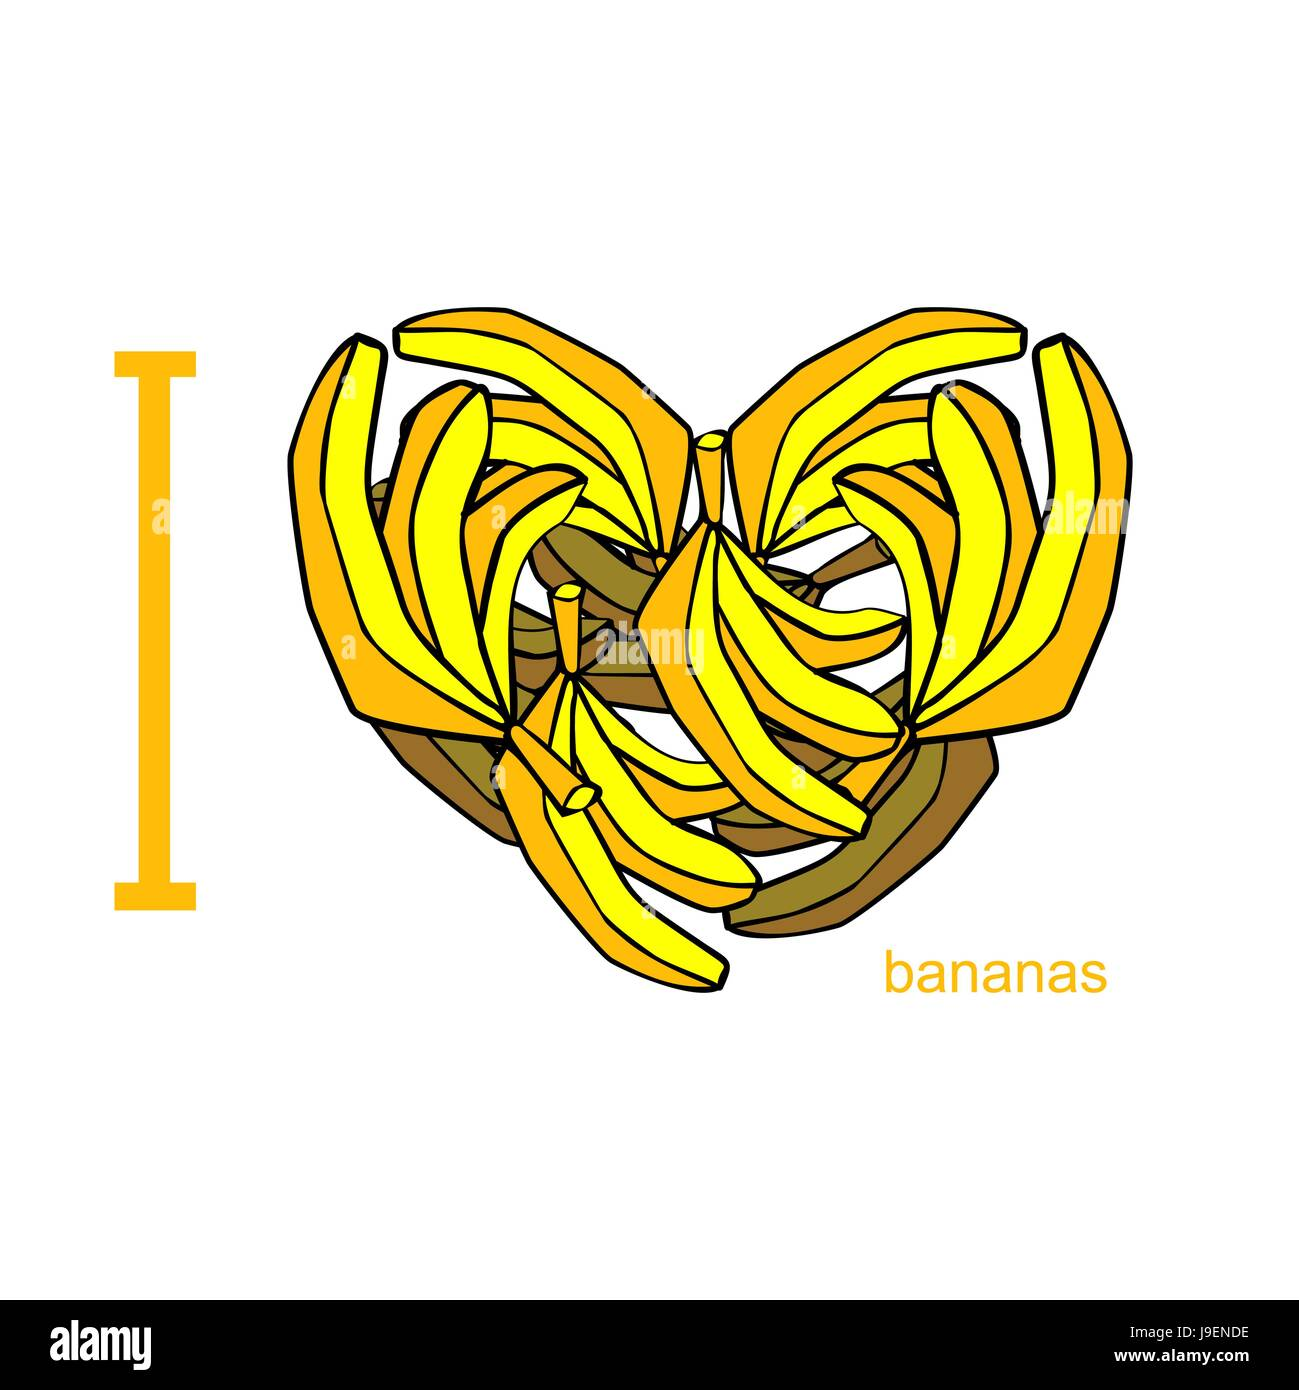 I love bananas symbol of heart of bananas tropical african fruit i love bananas symbol of heart of bananas tropical african fruit useful food for human health vector illustration biocorpaavc